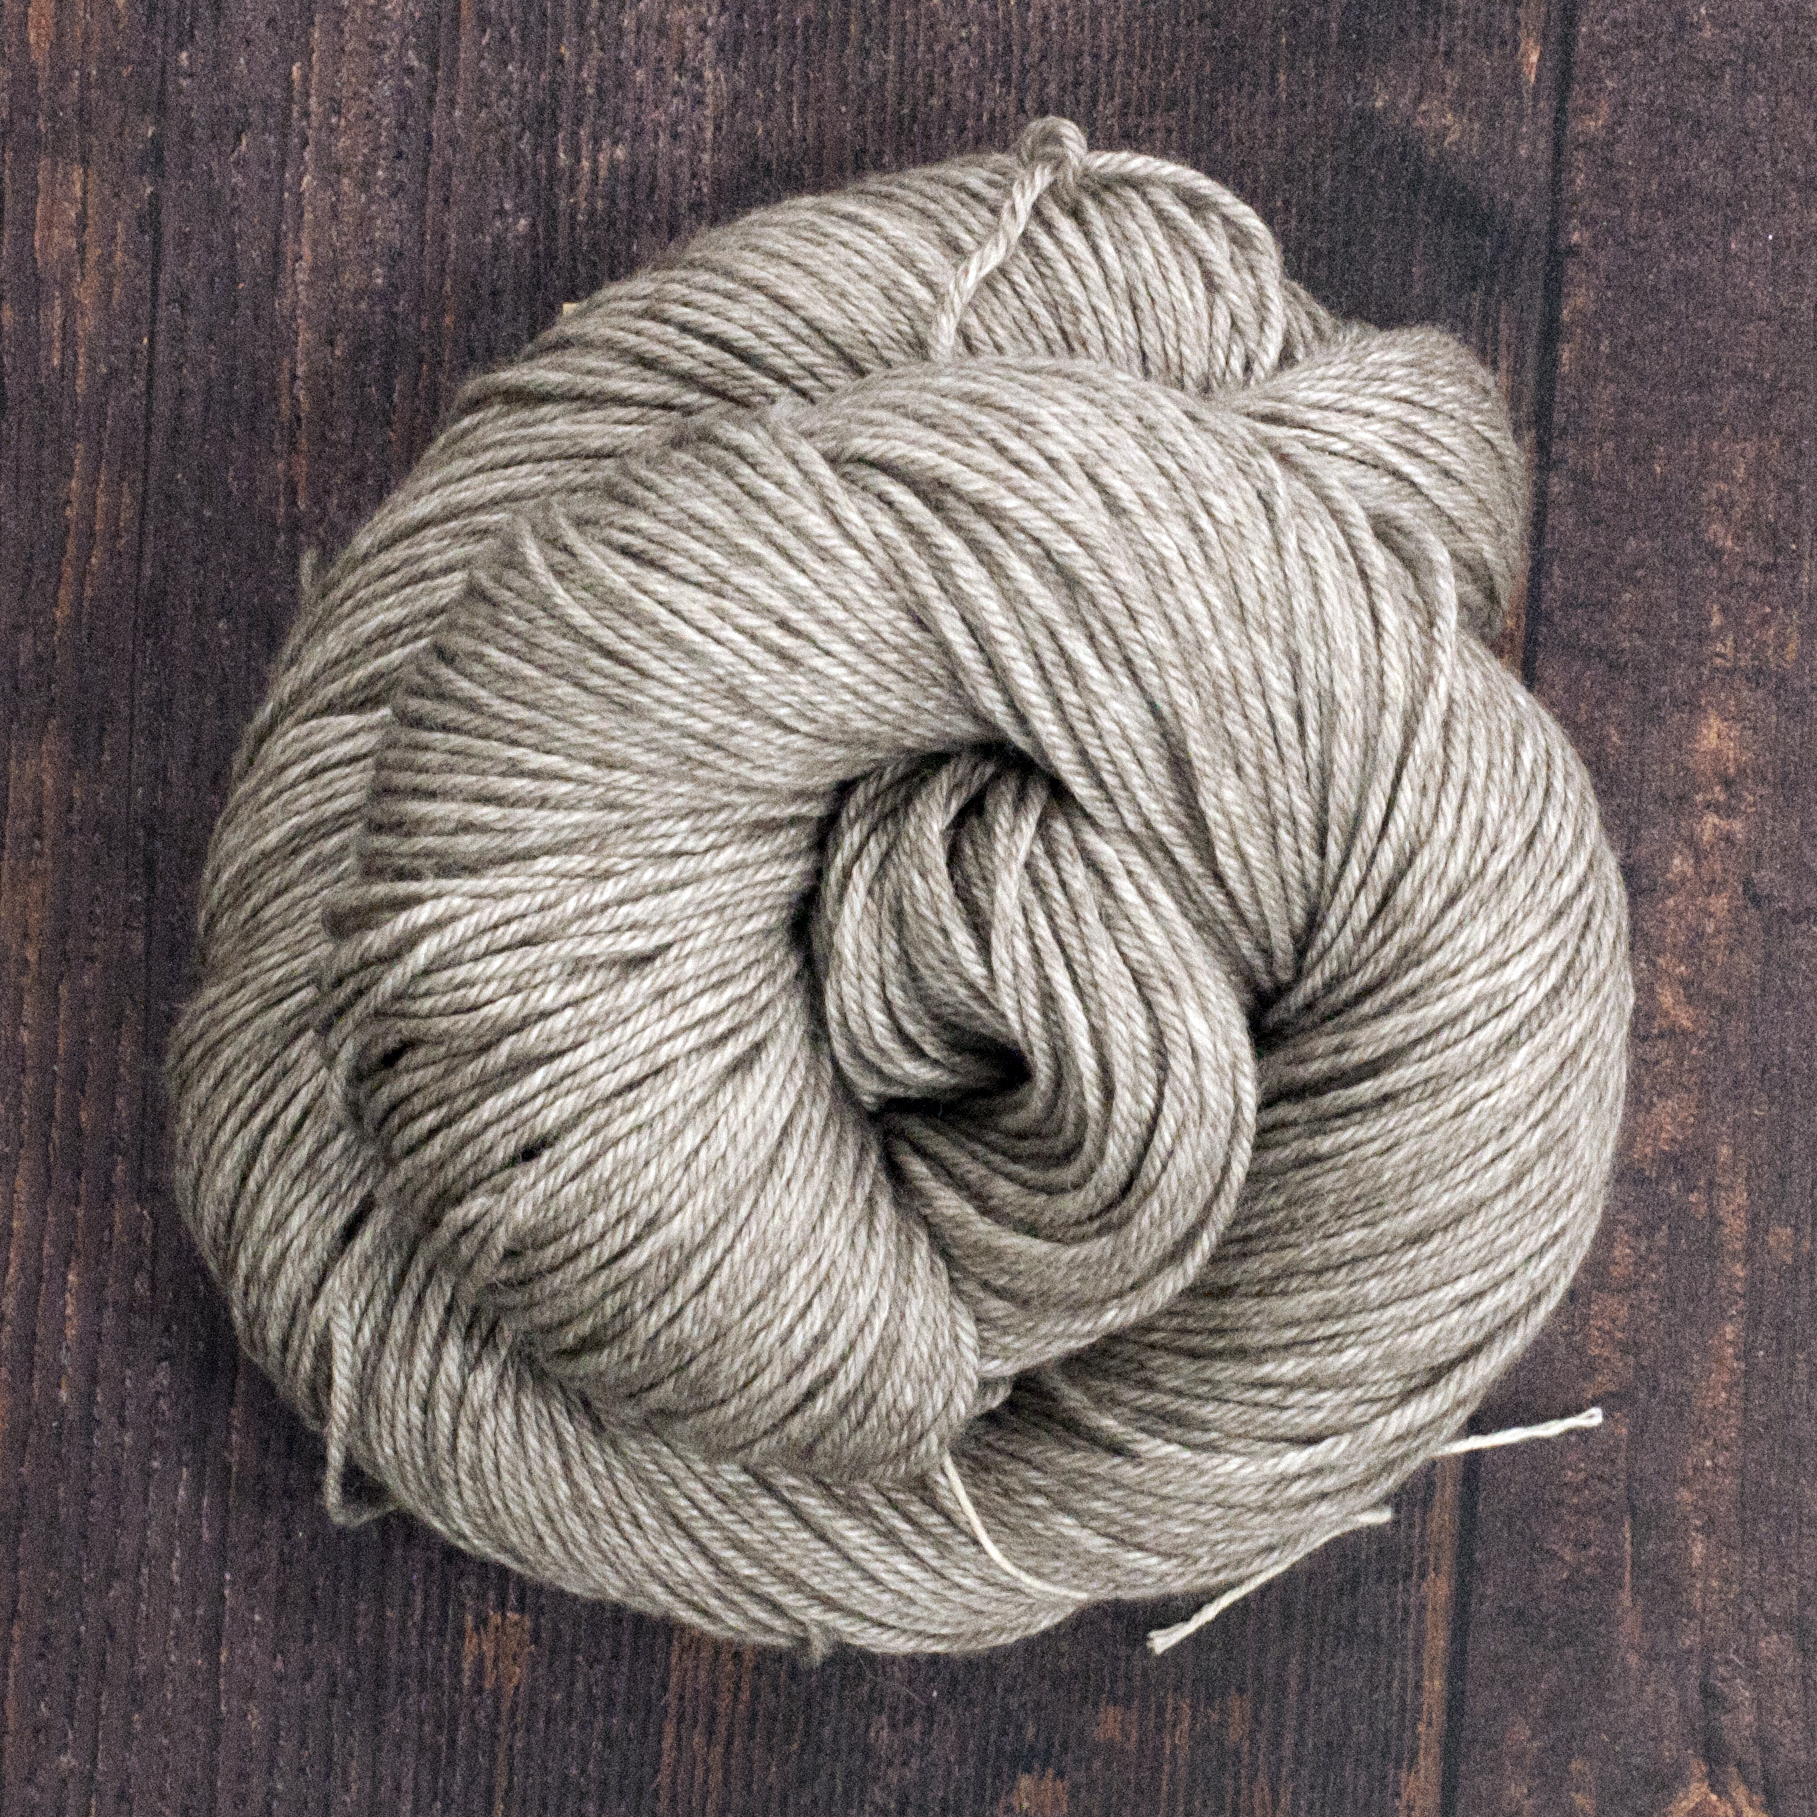 Type 49229  Tibetan DK 60% Superwash Merino Wool 20% Silk 20% Yak  100g Hanks 212m per 100g 4/8.5nm